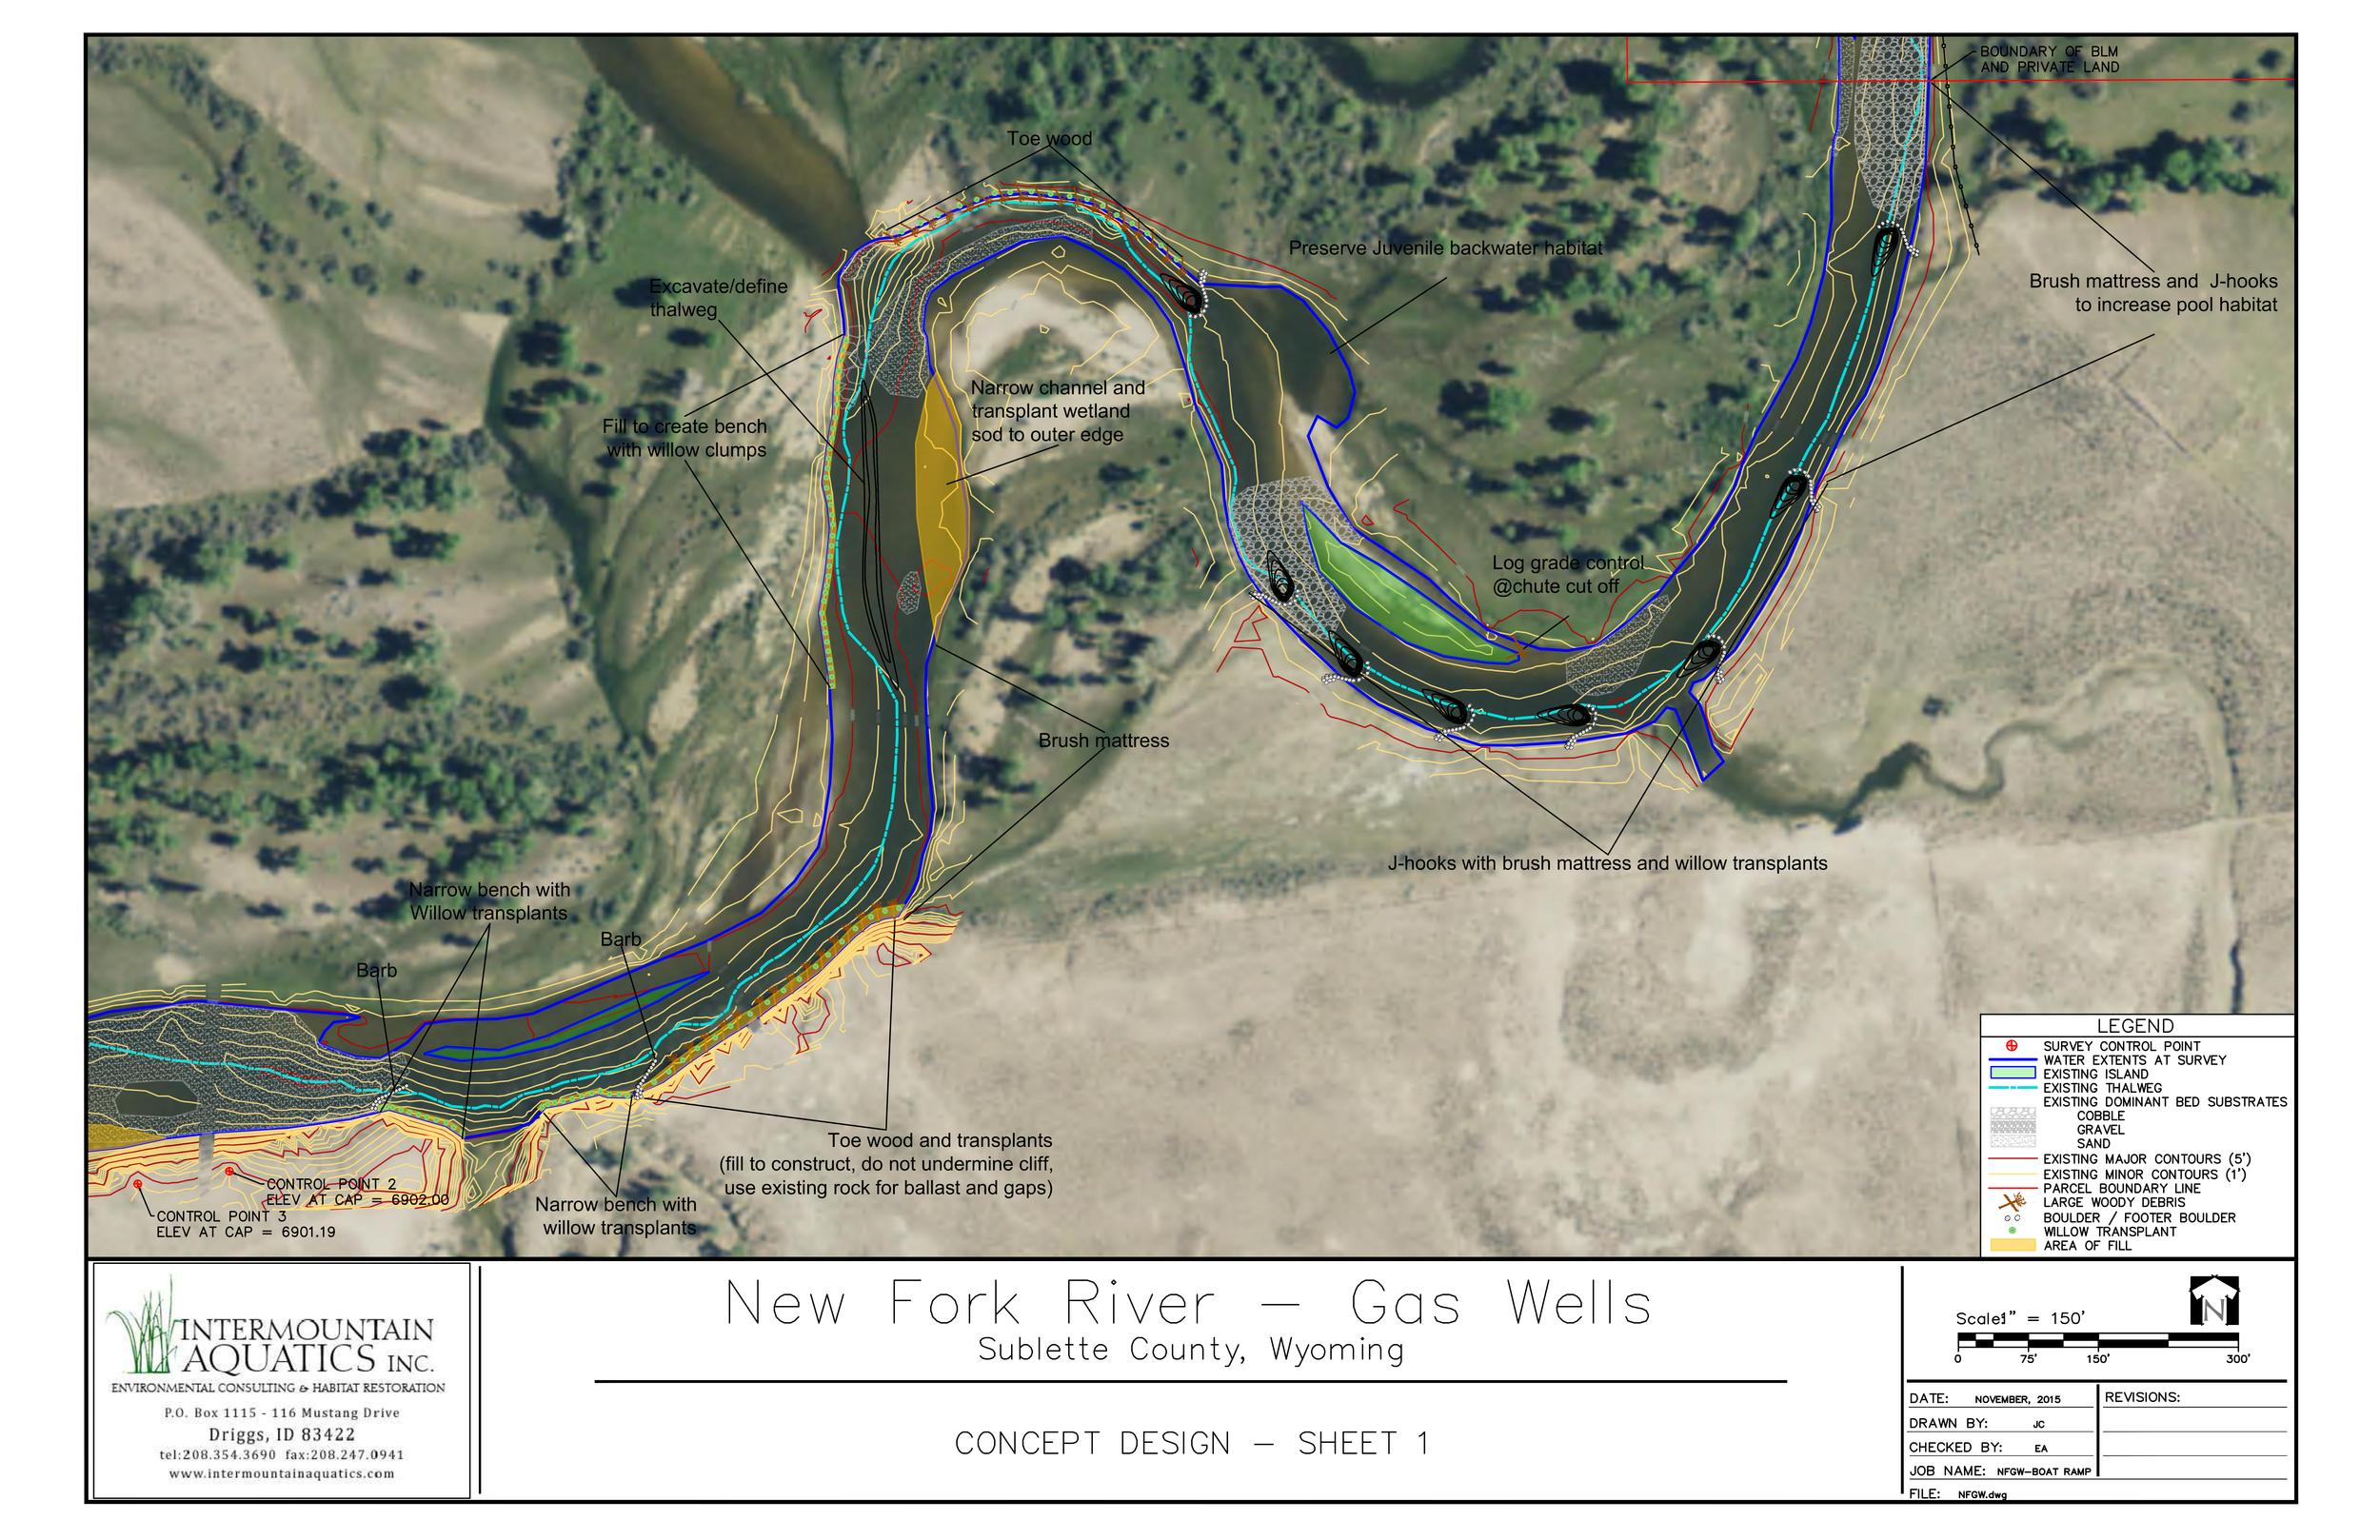 Stream Restoration plan view of the Concept Design